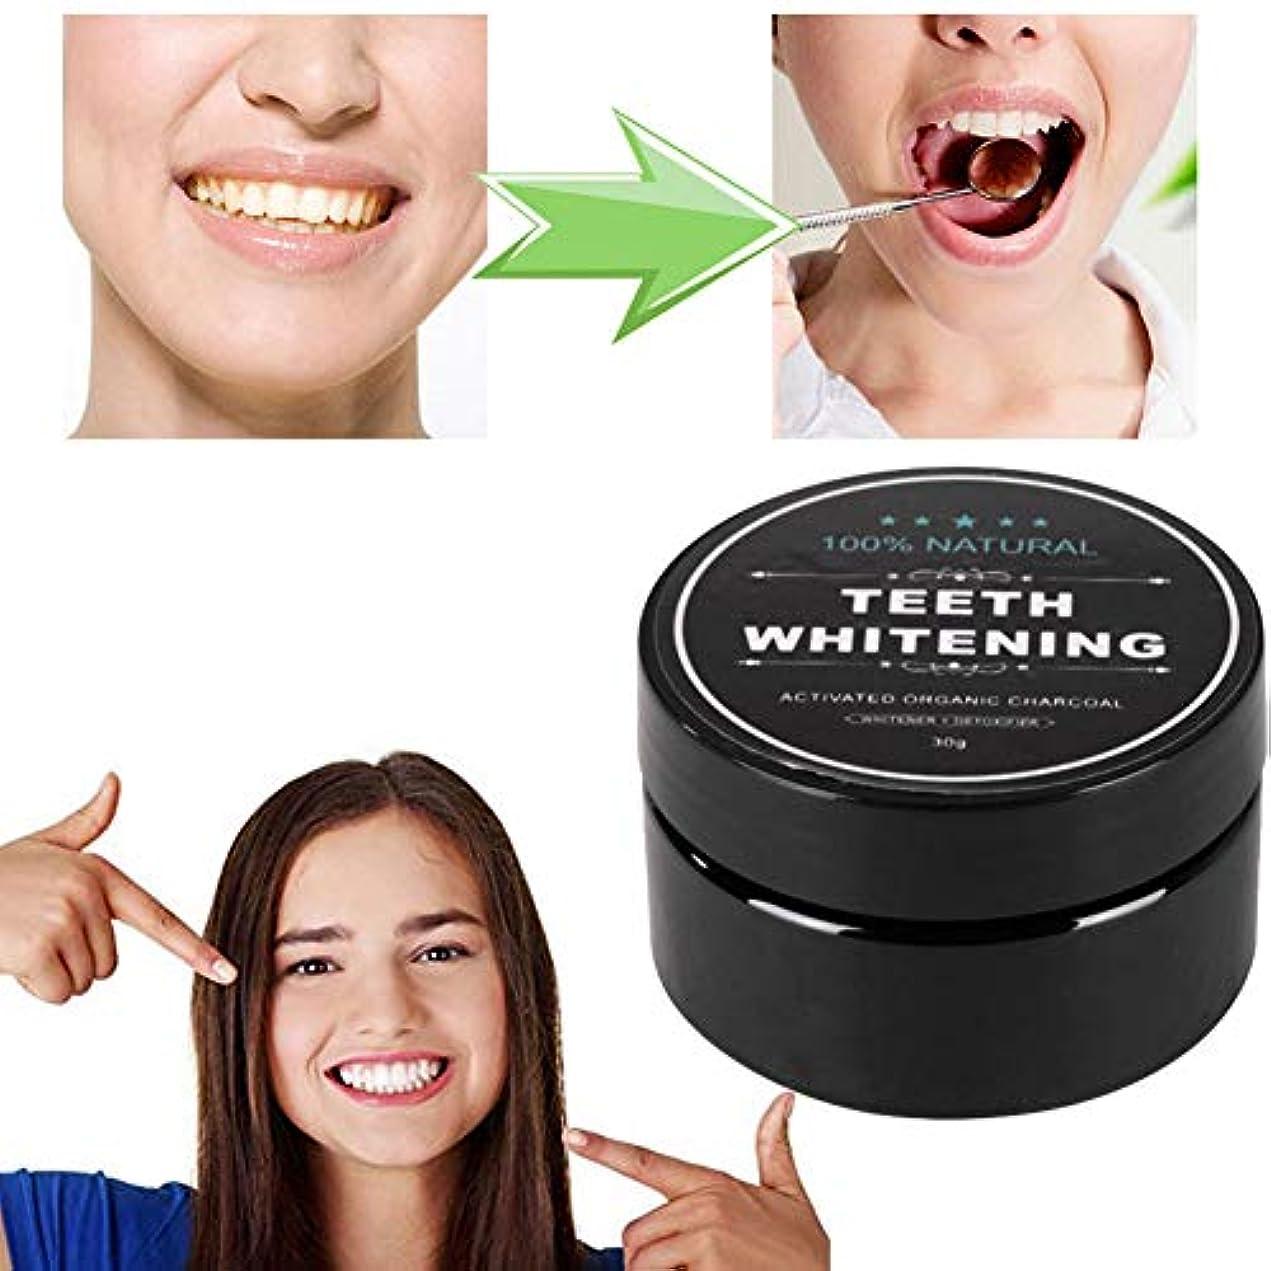 Frifer歯を白くする 活性炭ホワイトニング コーヒー•タバコ•ワインによる黄ばみを取り除く